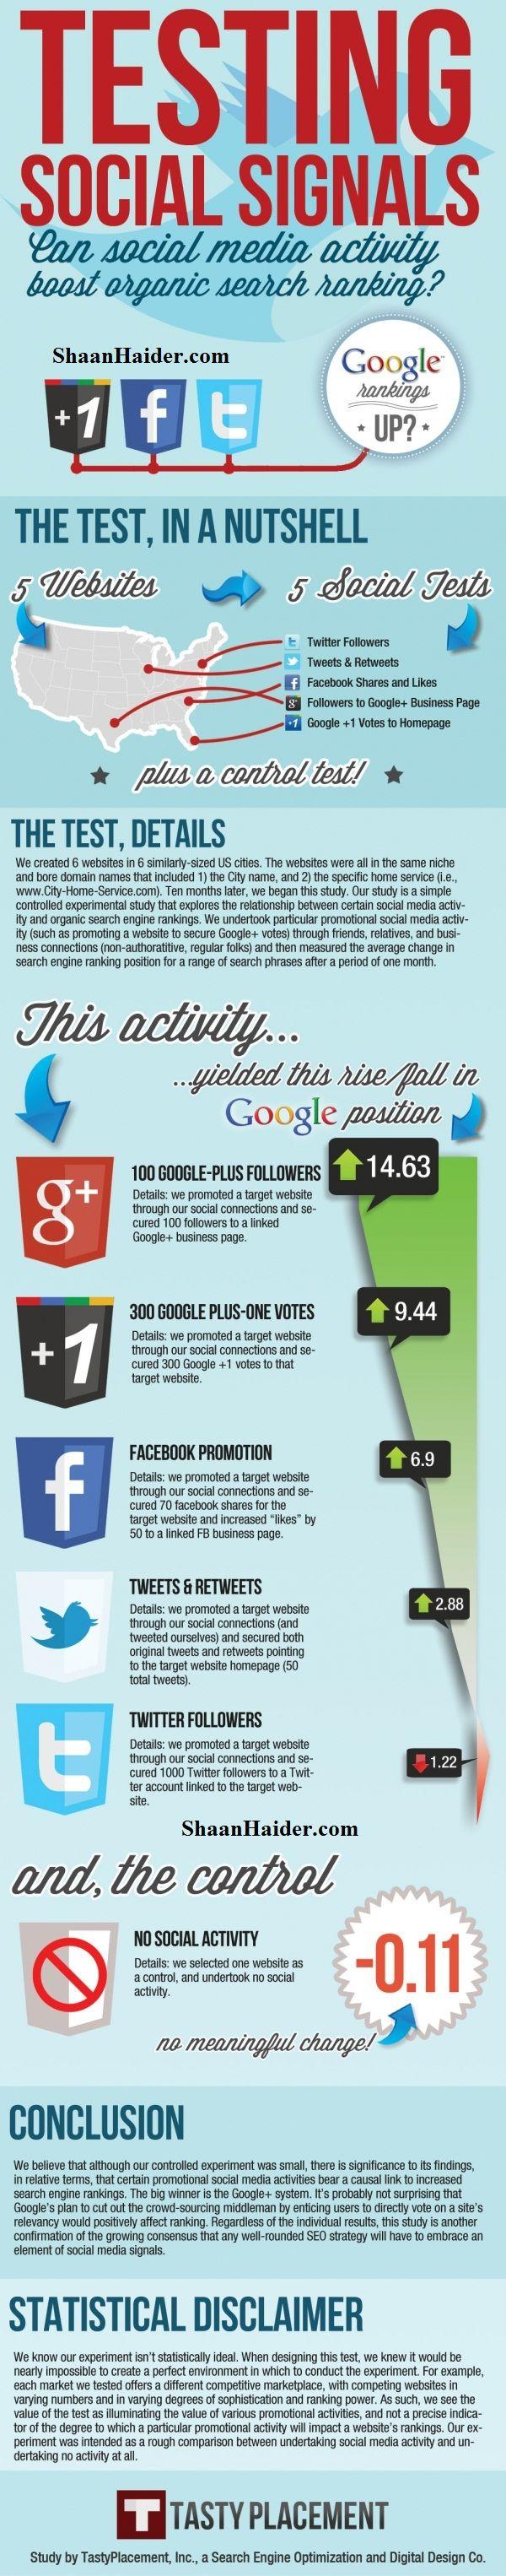 Best Social Media Sites for SEO (Infographic)